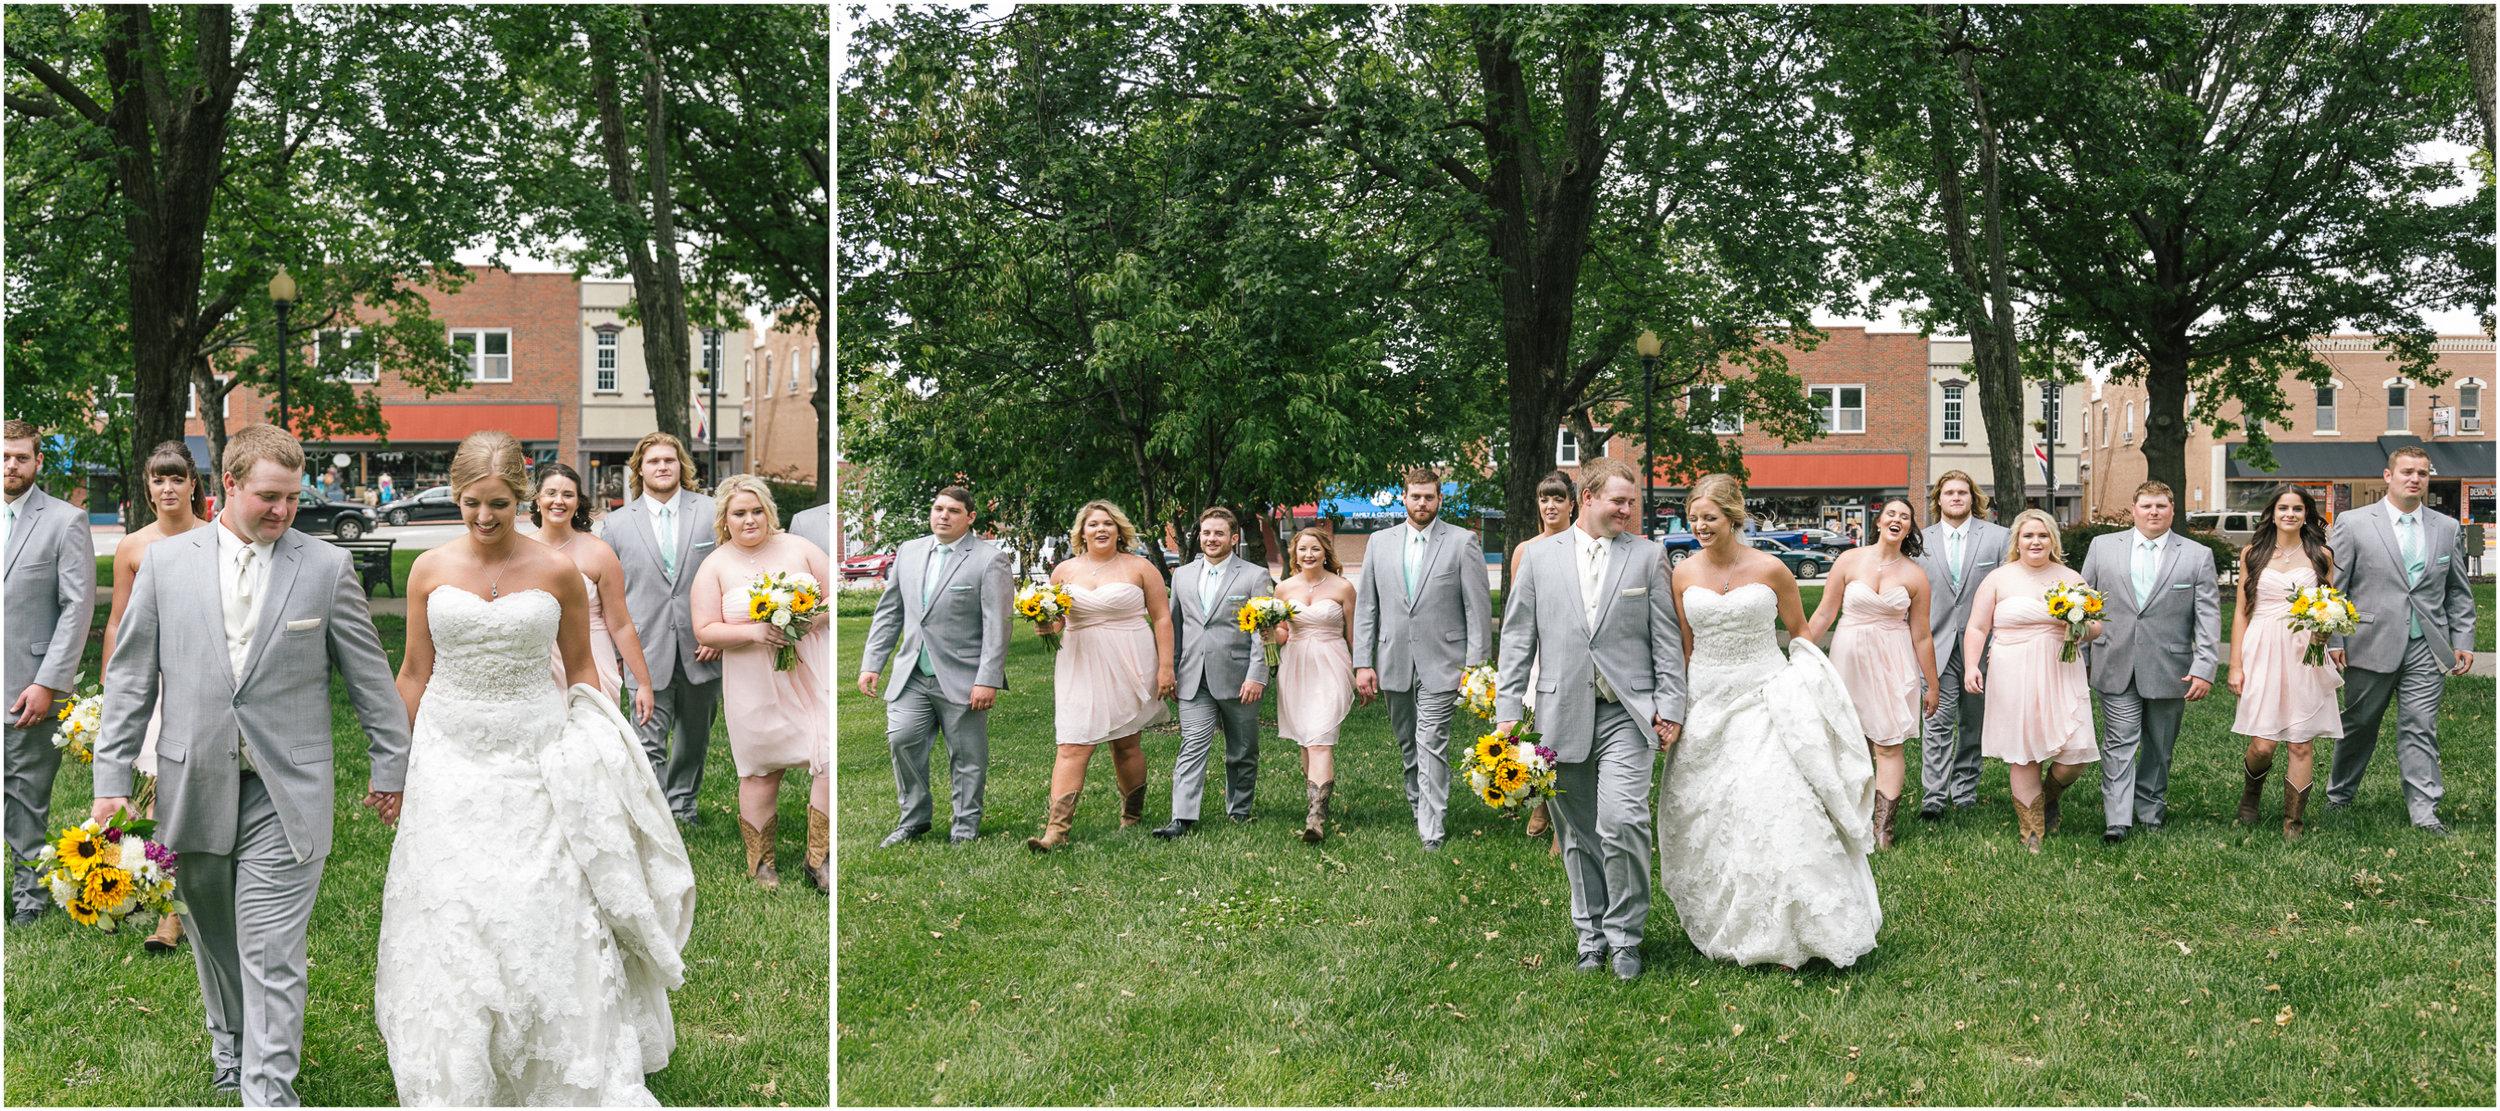 alyssa barletter photography louisburg kansas town square paola rustic wedding-17.jpg